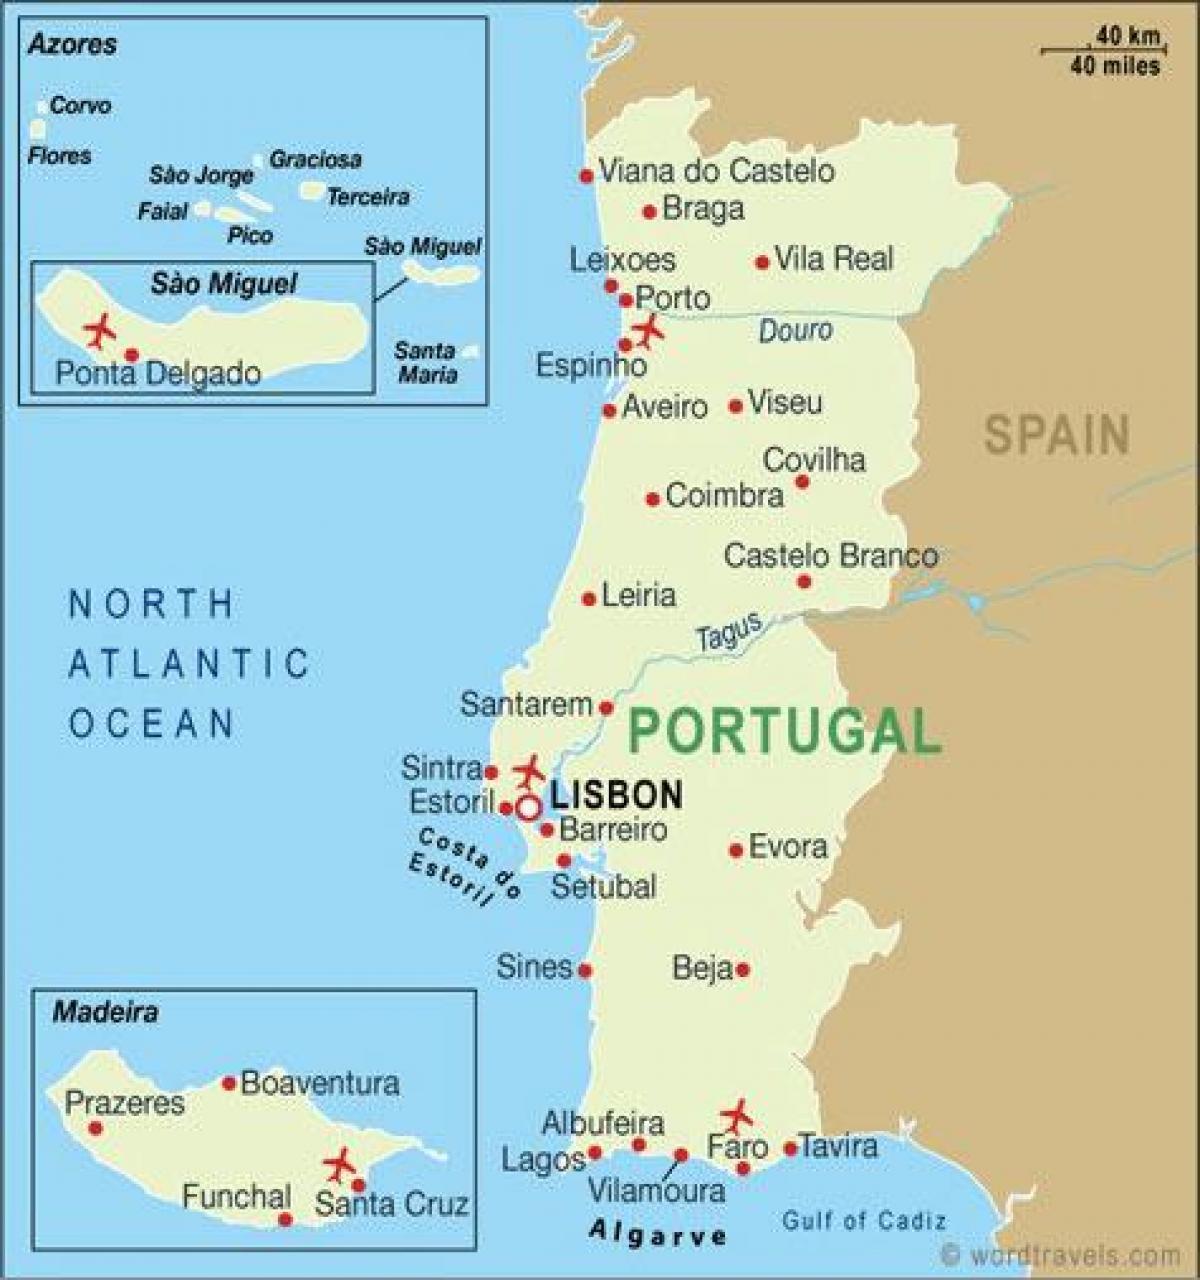 mapa aeroportos portugal Aeroportos em Portugal mapa   Mapa dos aeroportos de Portugal  mapa aeroportos portugal